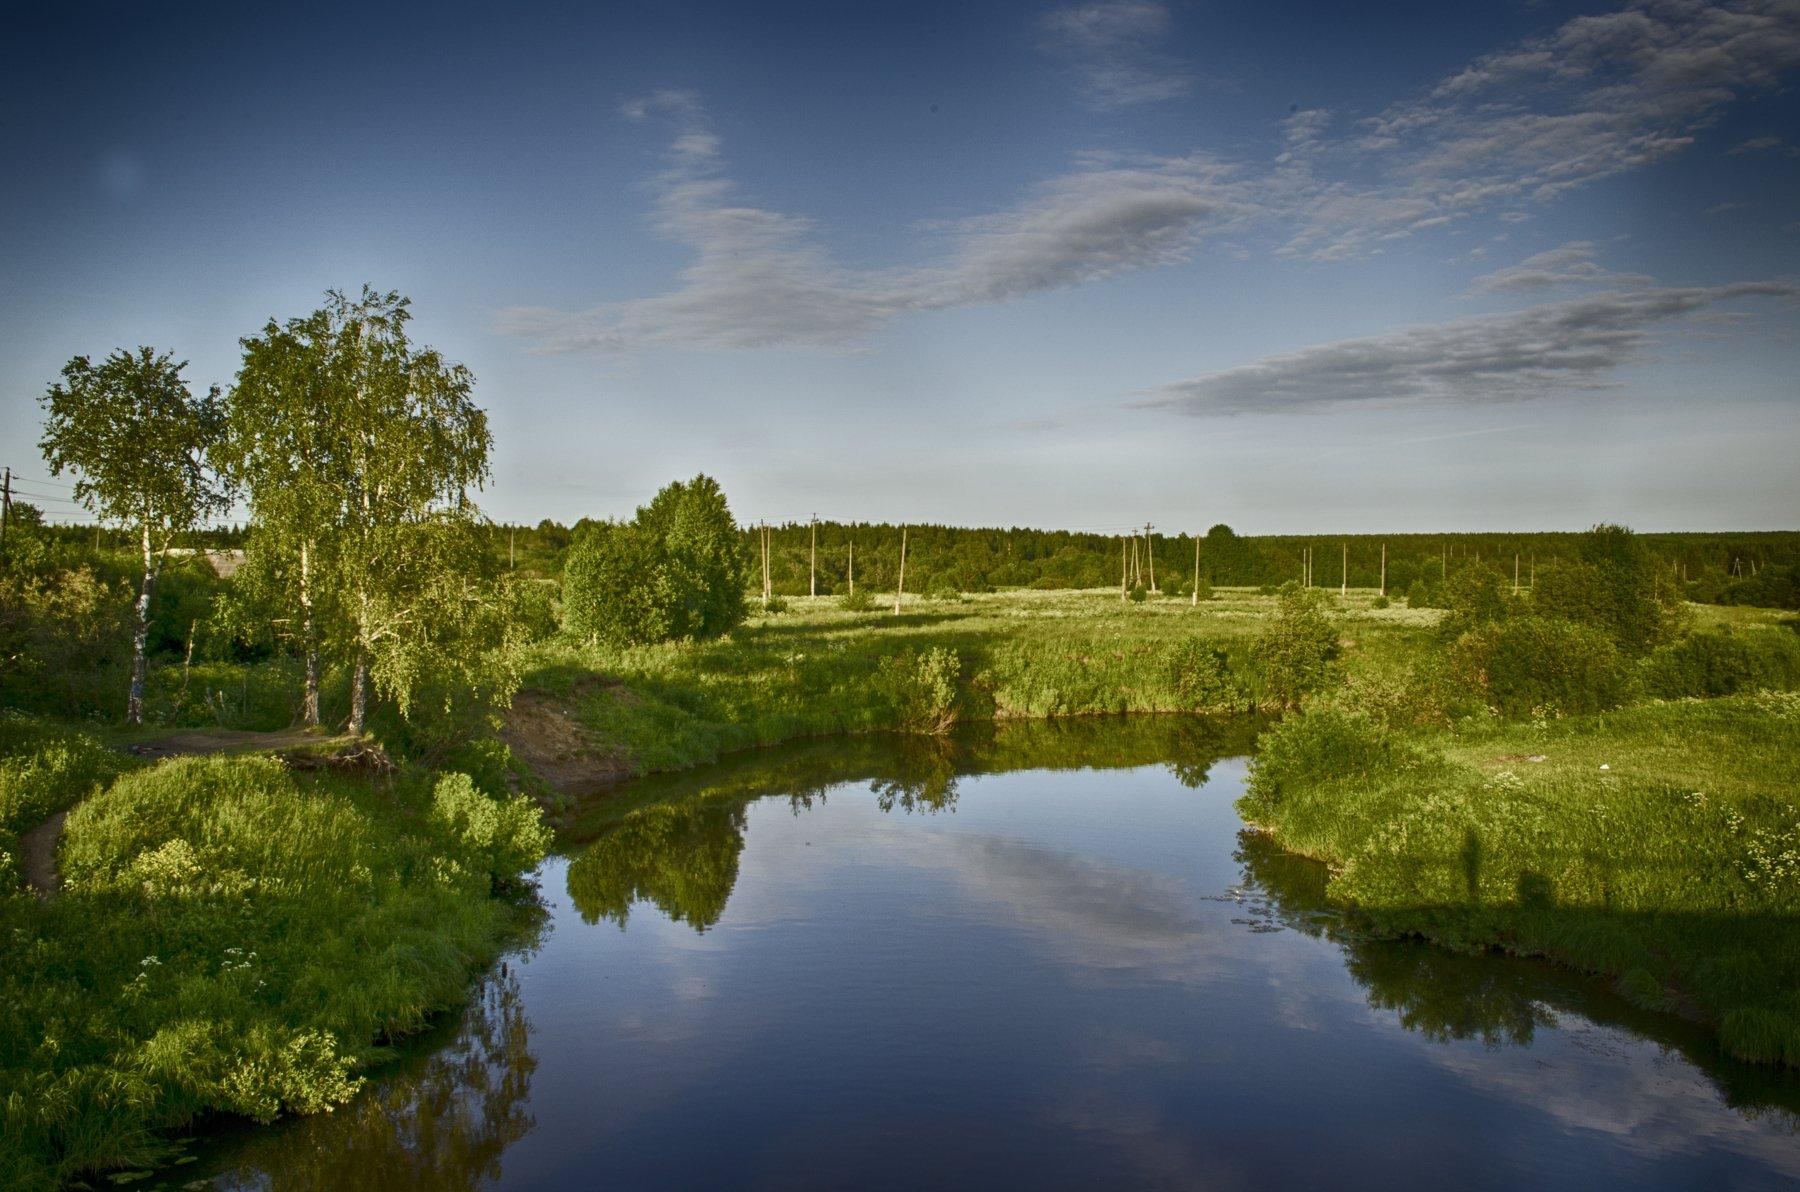 река,природа,провинция, Карепанов Евгений